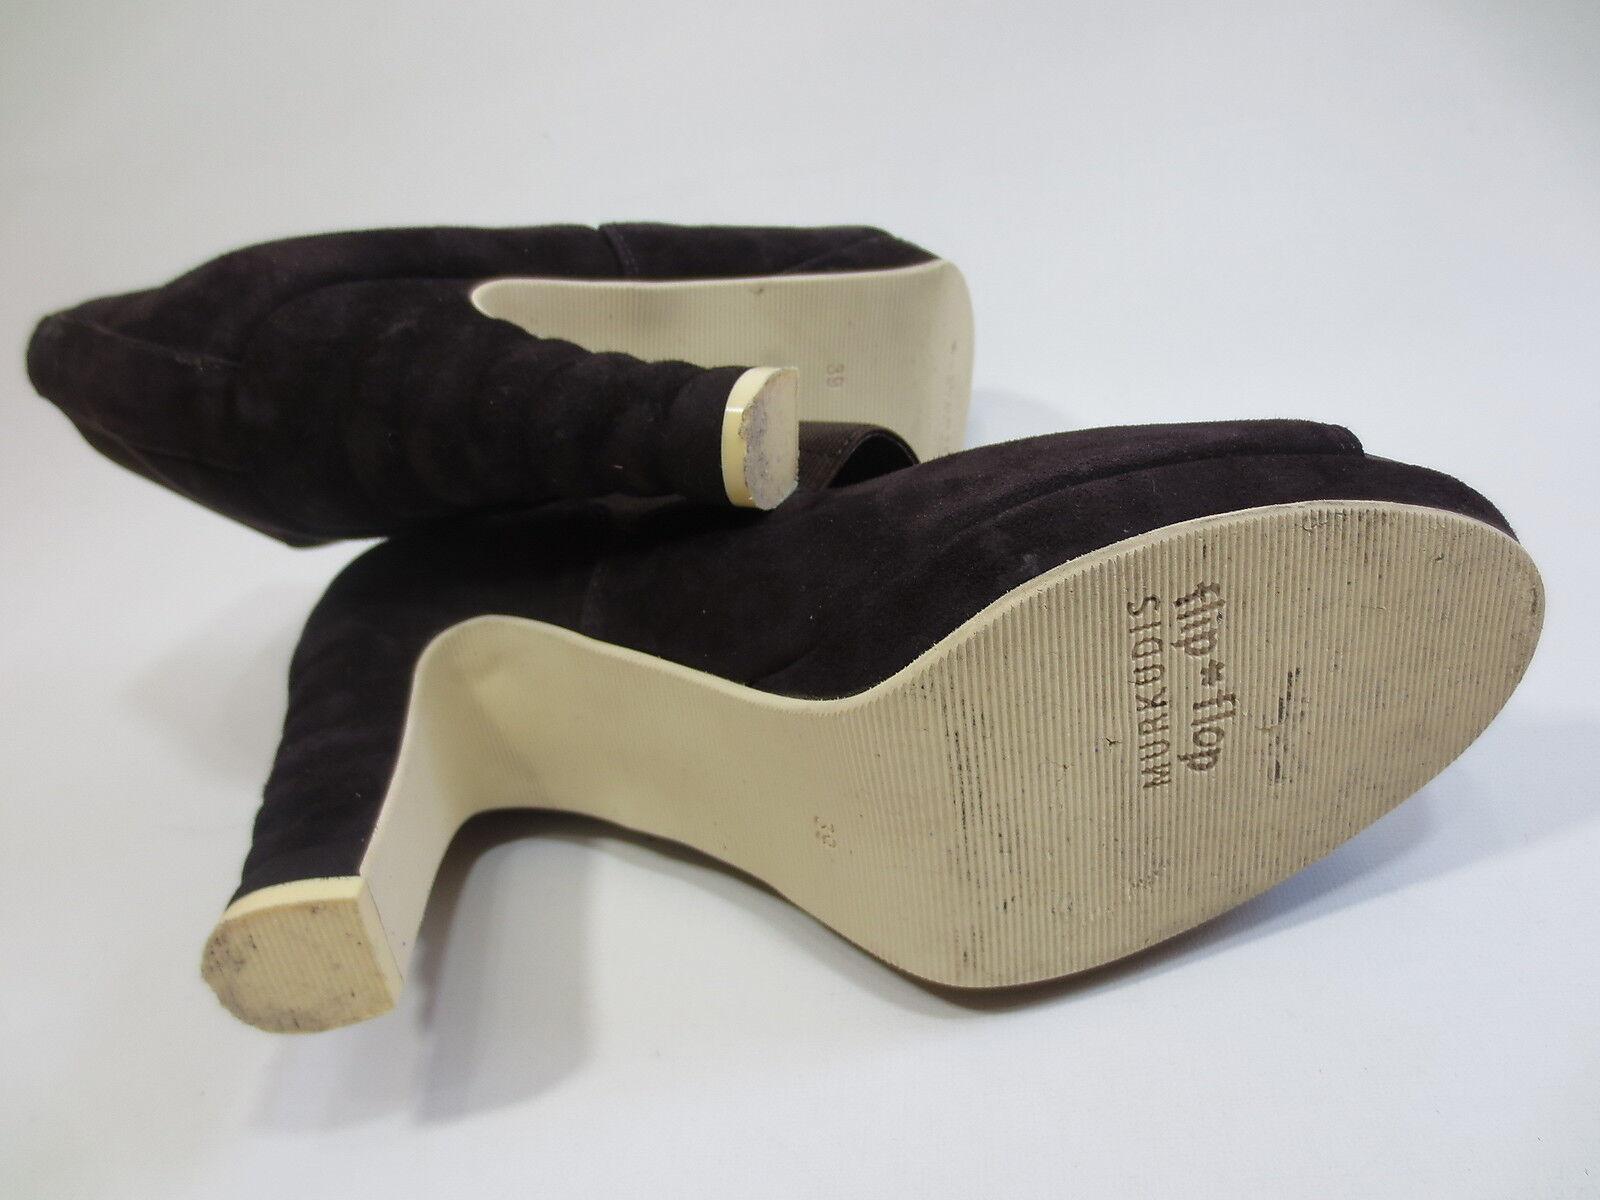 Sandalette MURKUDIS Flip Flip Flip Flop Hochfront Pumps 39 Leder braun TIP TOP /Z4 b74aa7